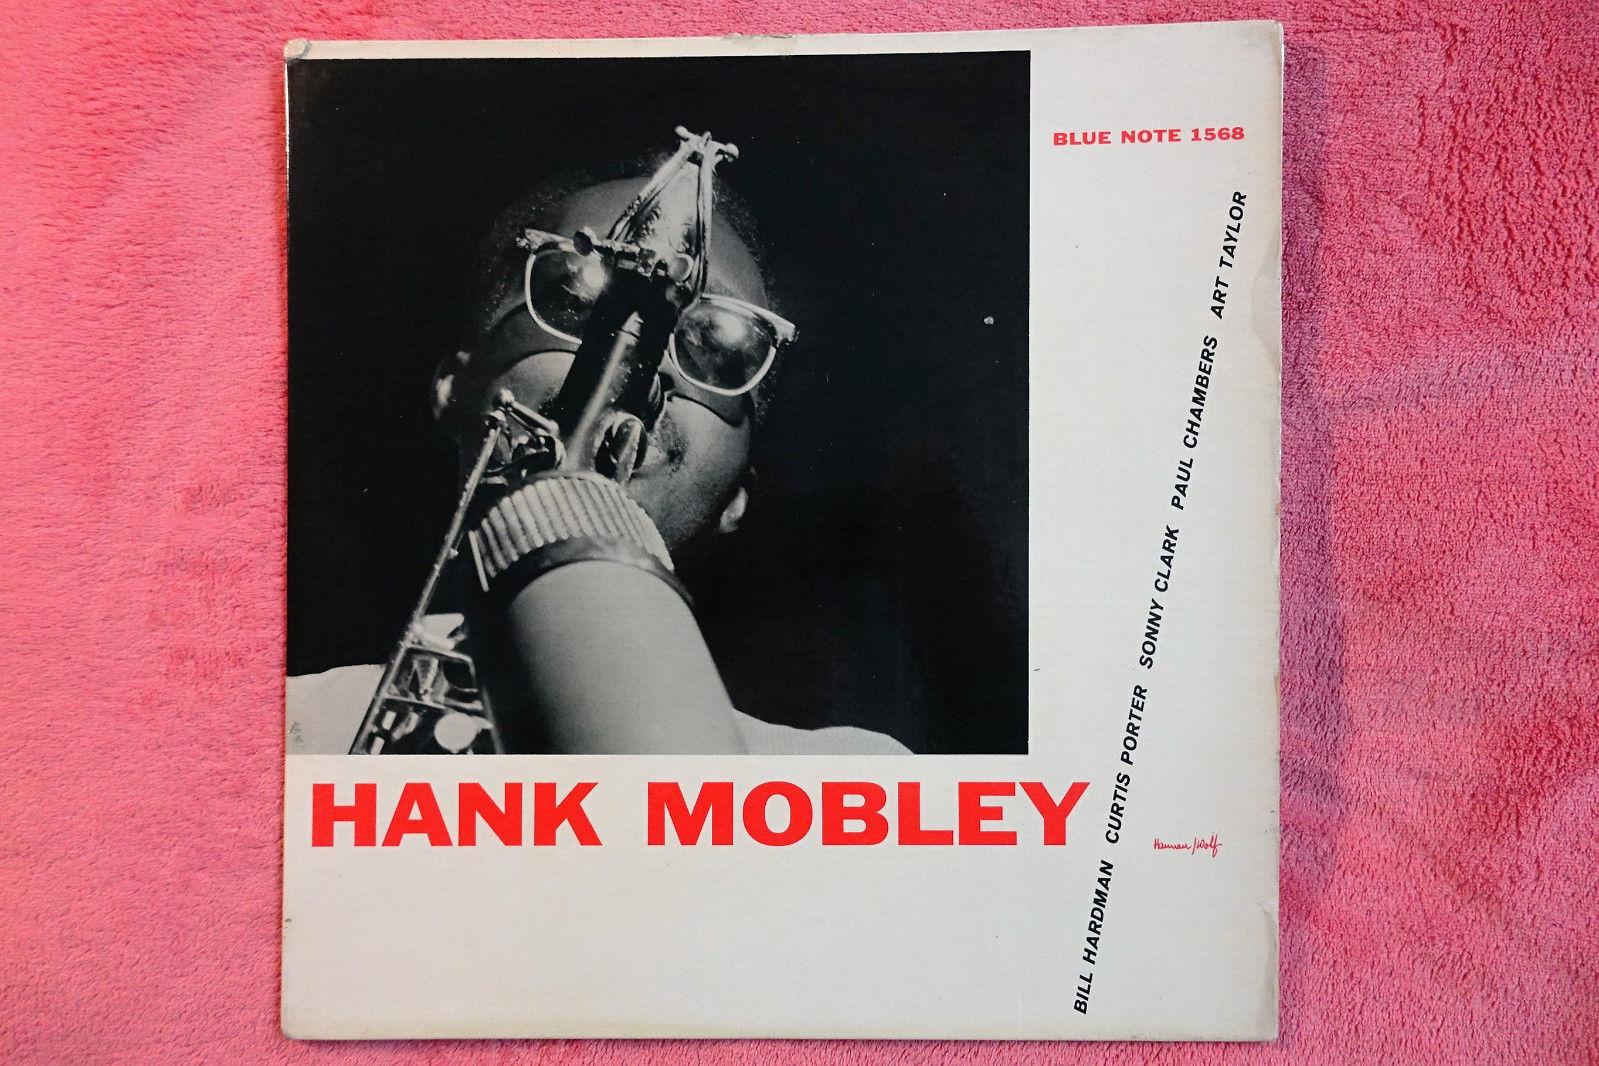 HANK MOBLEY 'SELF TITLE'  BLP 1568. PROMOTION COPY.SIDE A:NYC/SIDE B:NEW YORK 23